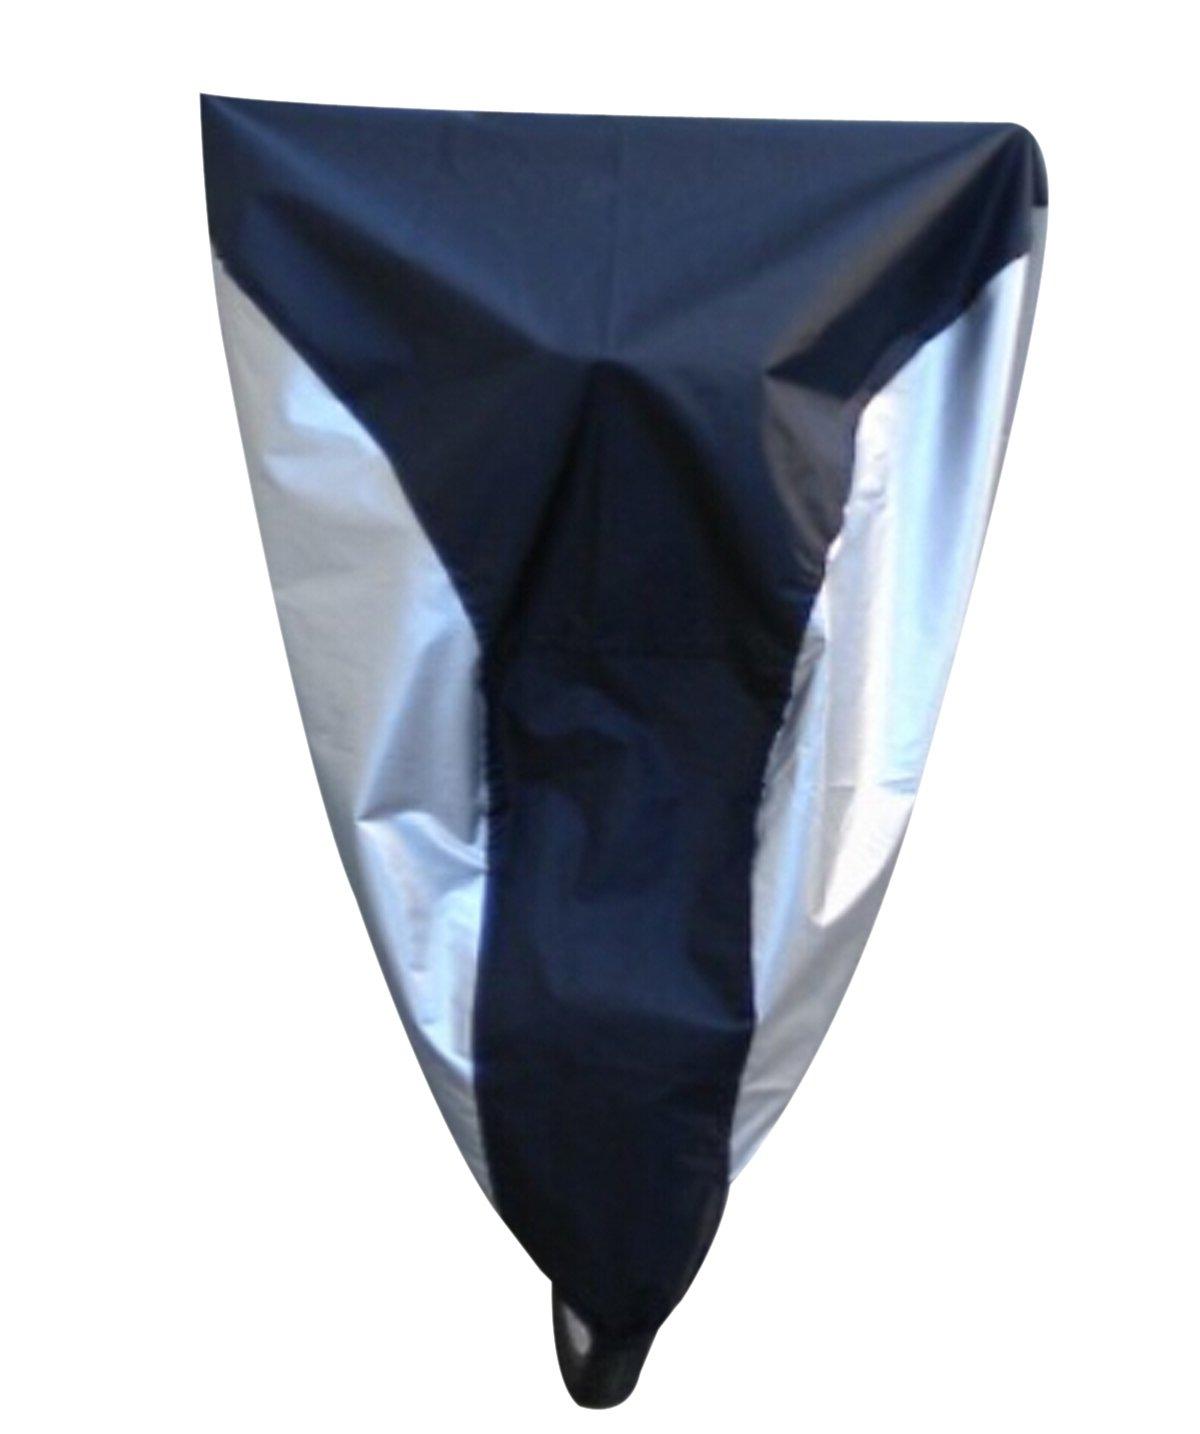 Natuworld S//M//L//XL Waterproof 180T Polyester Taffeta Bike Bicycle E-Bike Cover,Silver /& Black